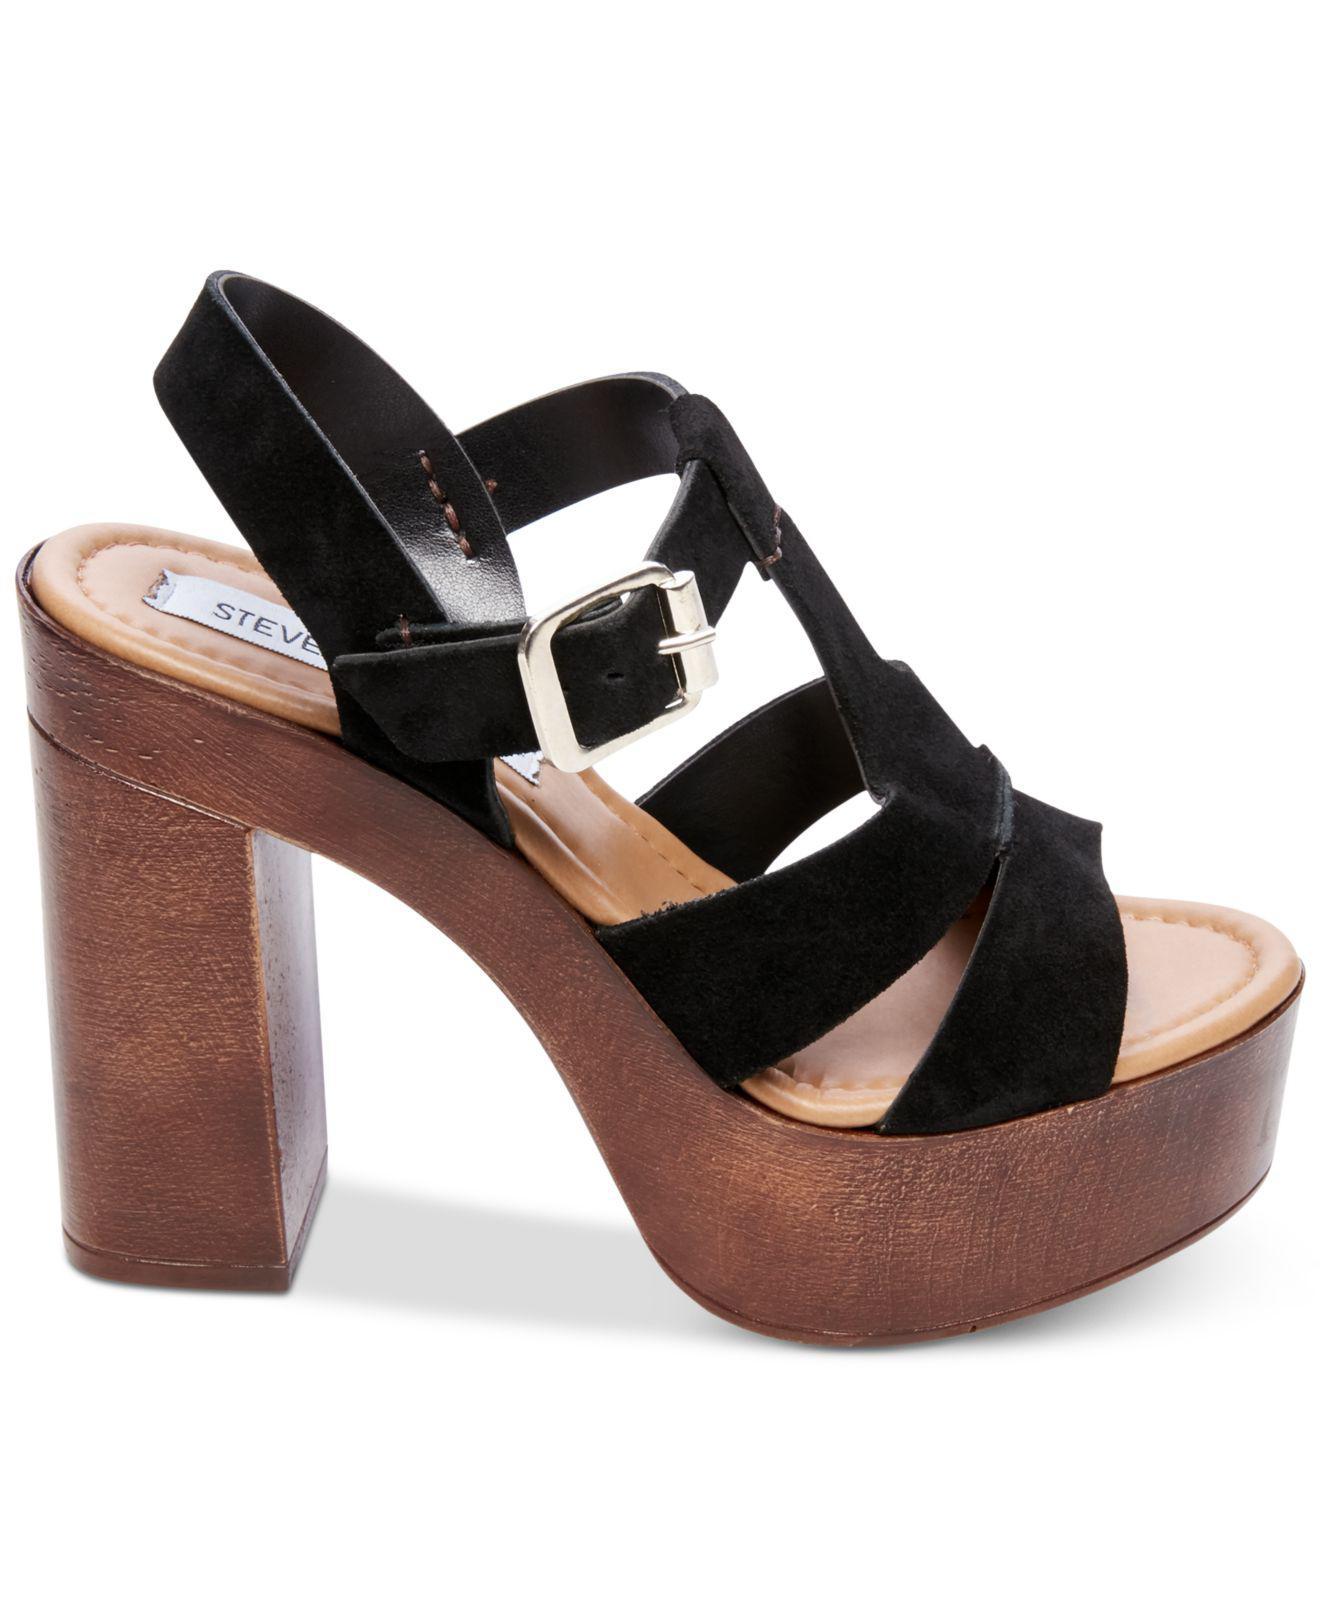 f8e0399a8168 Steve Madden Lucile T-strap Platform Sandal in Black - Lyst